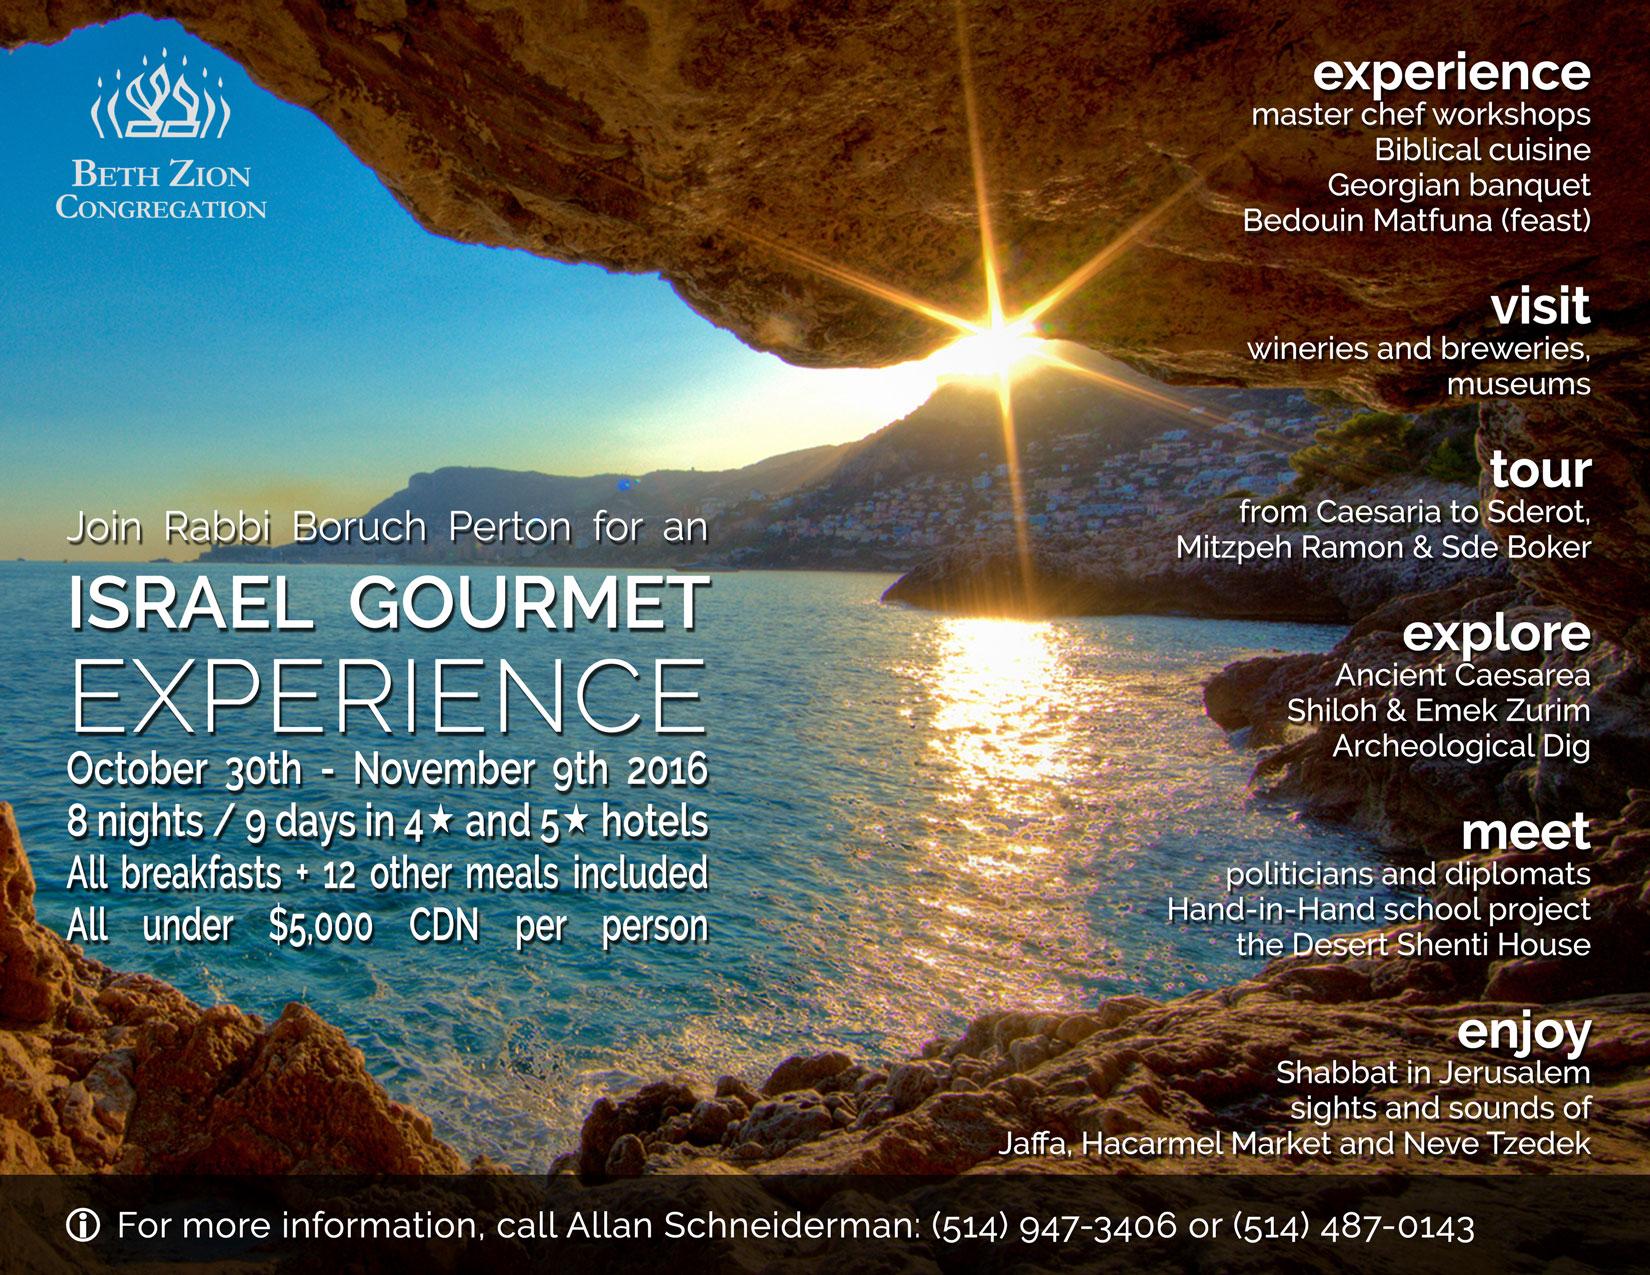 Beth Zion Israel Gourmet Experience